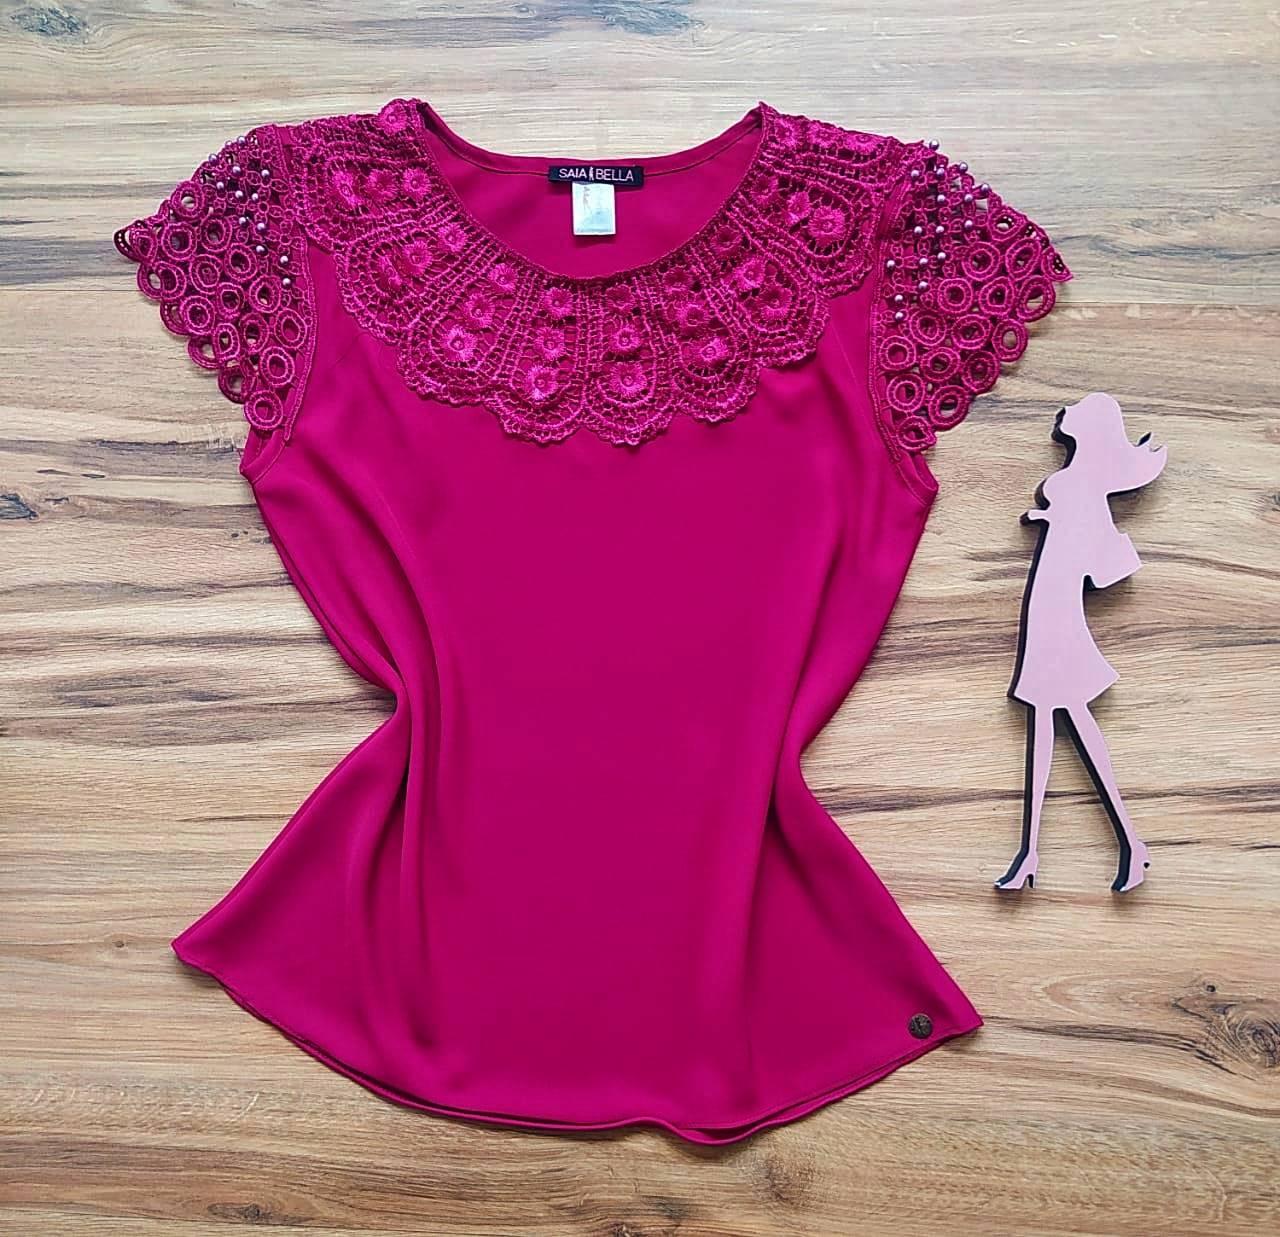 Blusa Fiorella de Renda Saia Bella - SB79902 Purpura